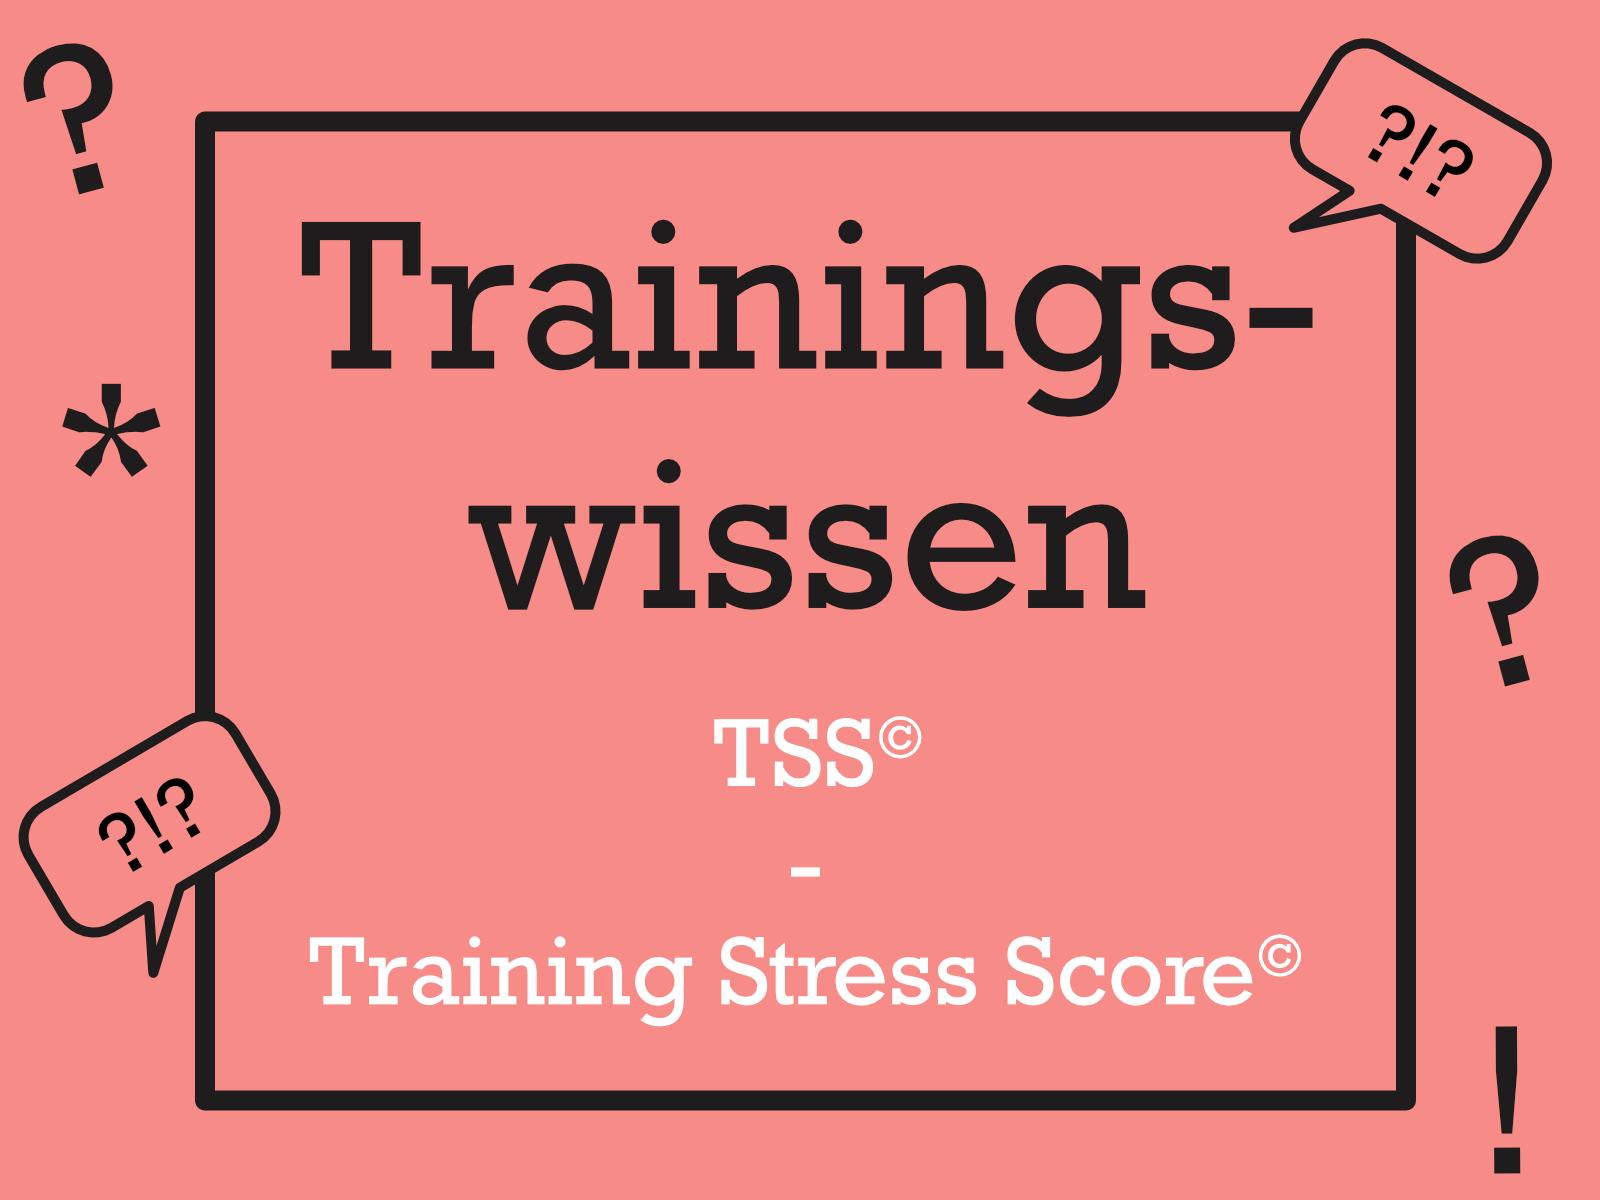 trainingswissen_tss